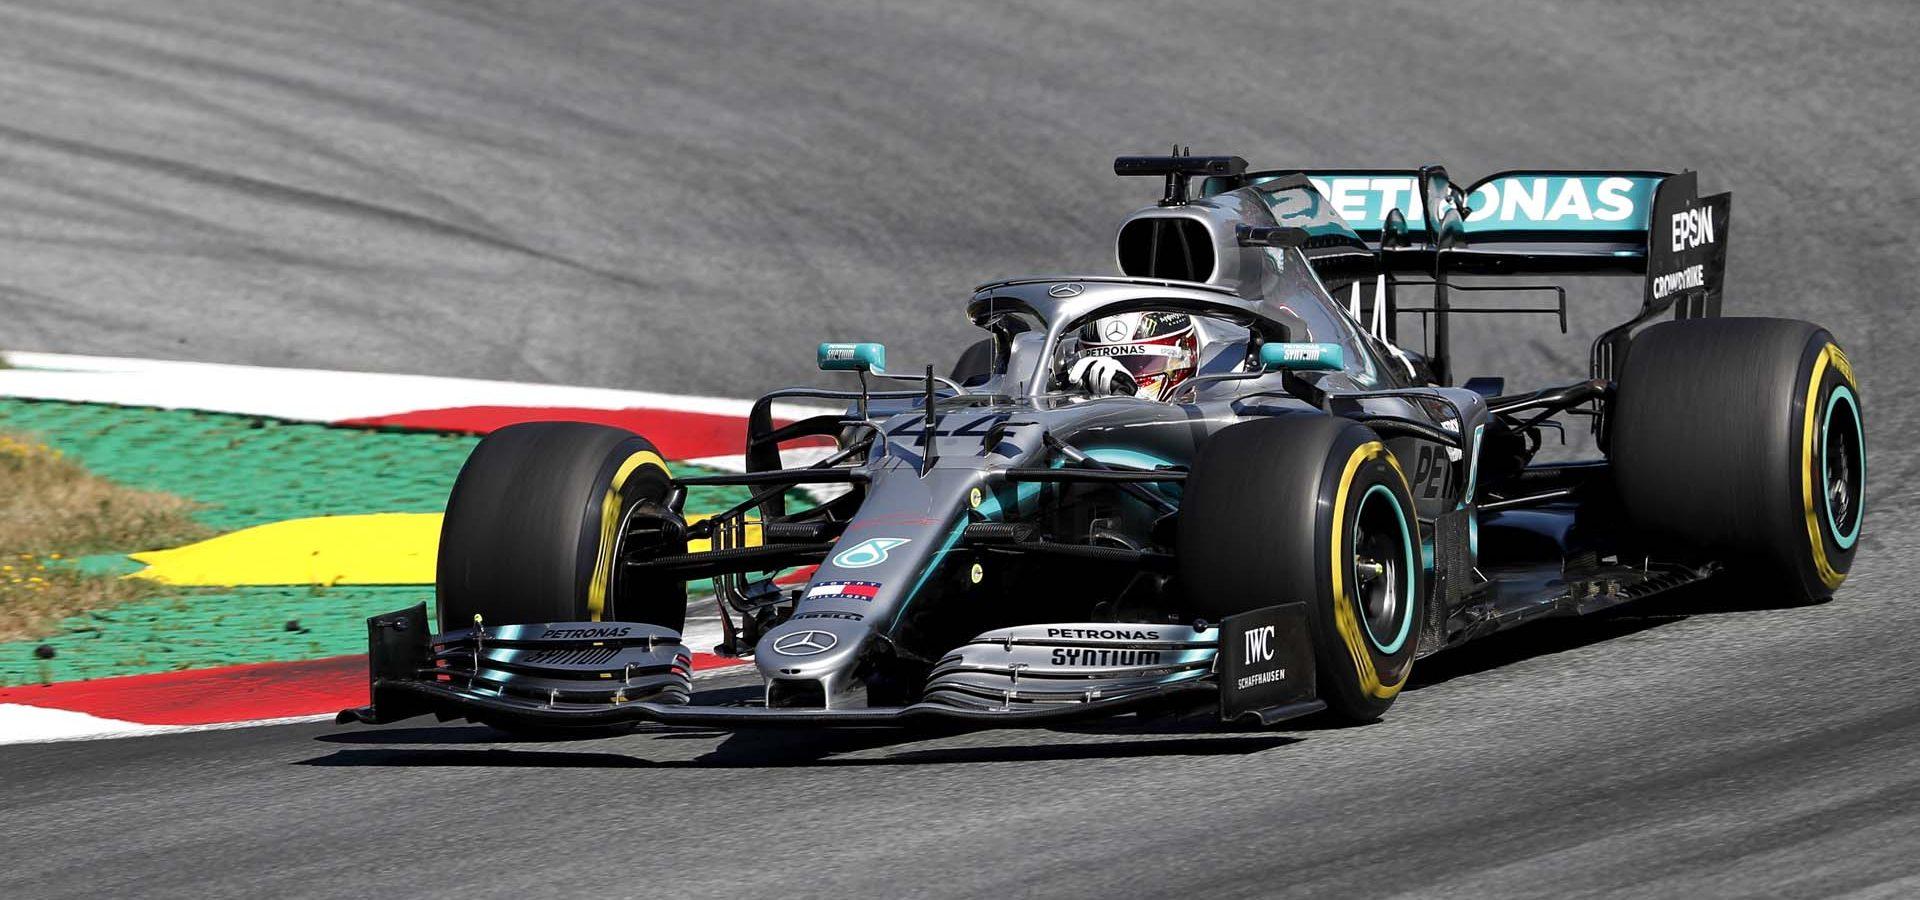 2019 Austrian Grand Prix, Sunday - LAT Images Lewis Hamilton Mercedes